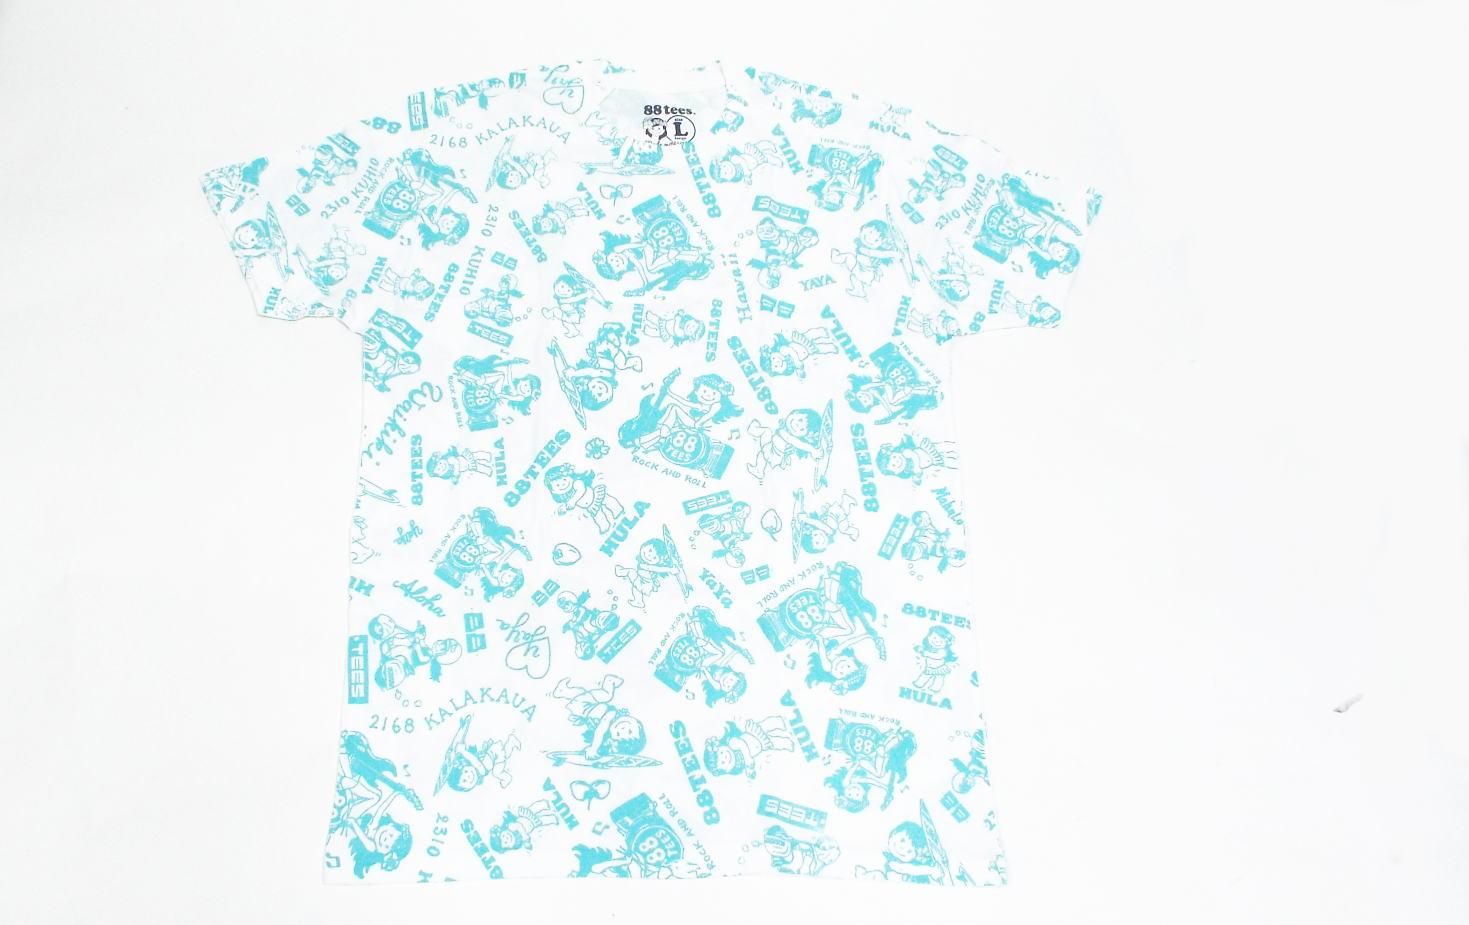 88TeesオリジナルTシャツ メンズ ロゴ L サイズホワイト/ブルー